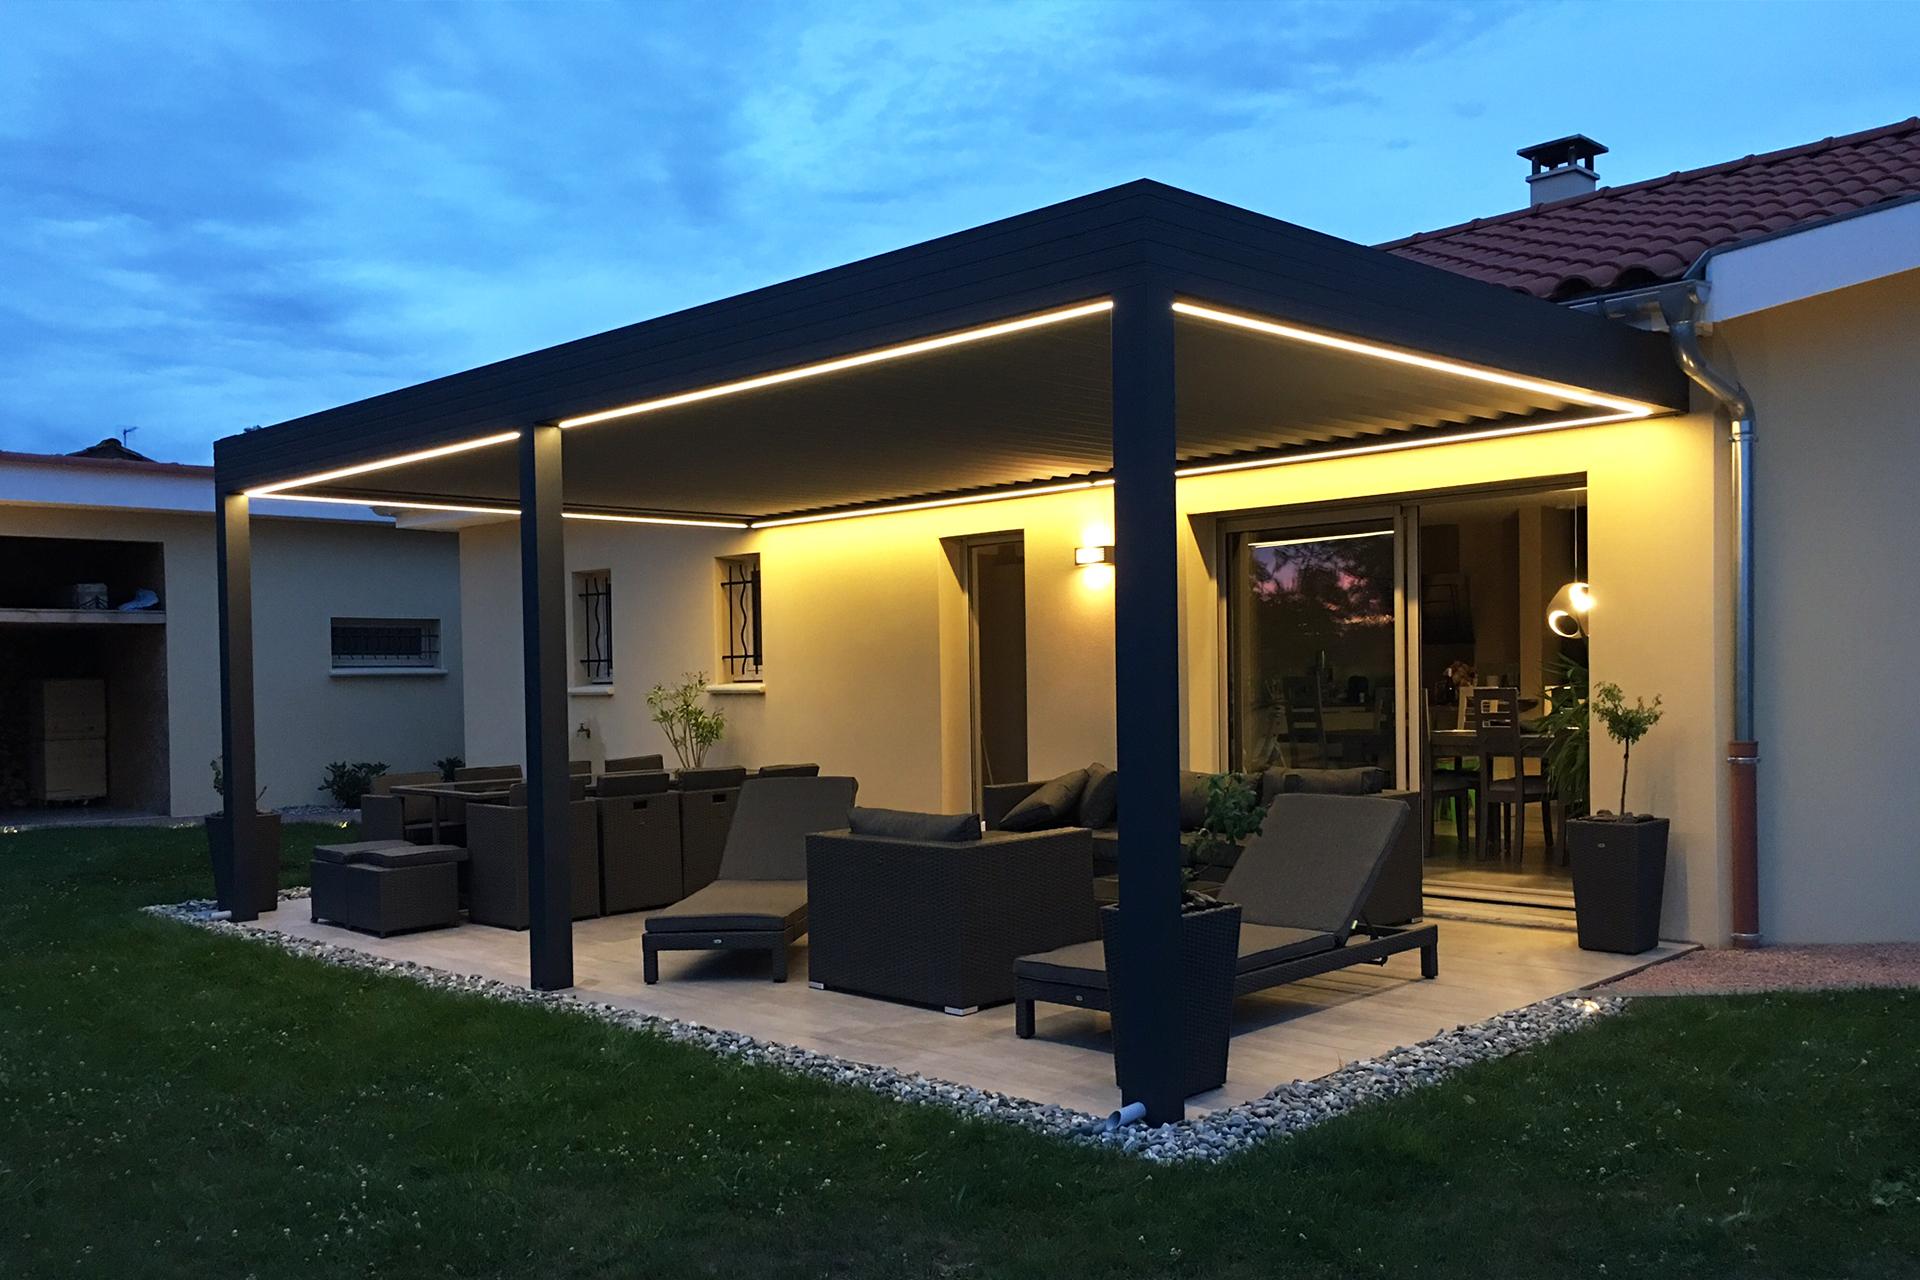 Vente installation et cr ation de pergolas alu et brise soleil b ziers - Mobilier de veranda ...